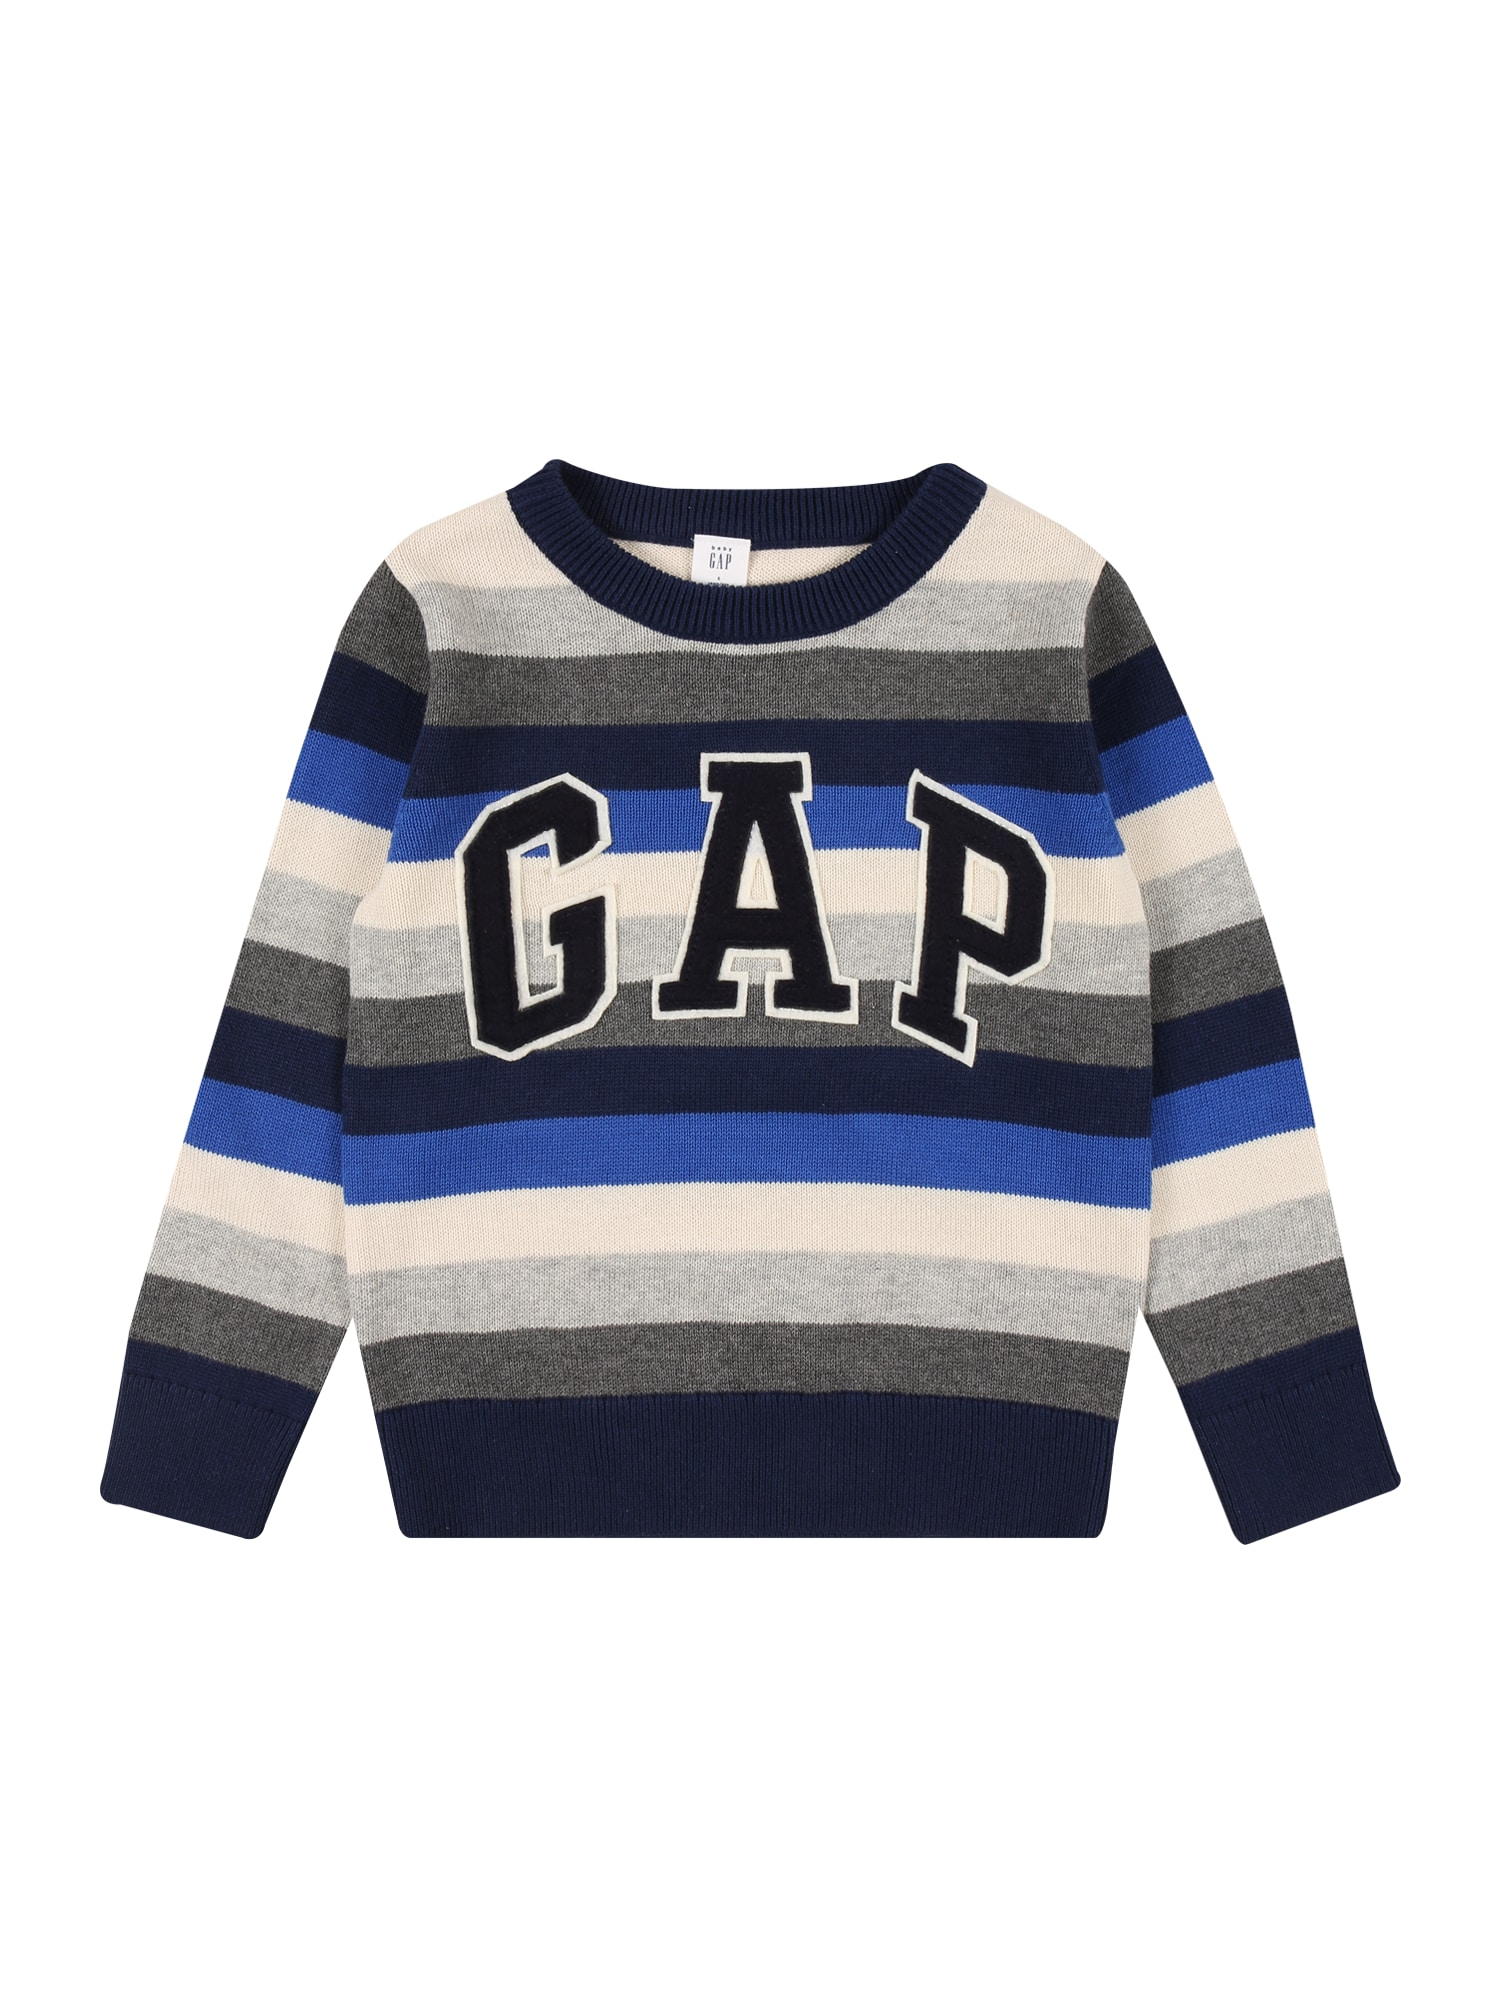 GAP Megztinis mėlyna / tamsiai mėlyna / balta / margai pilka / tamsiai pilka